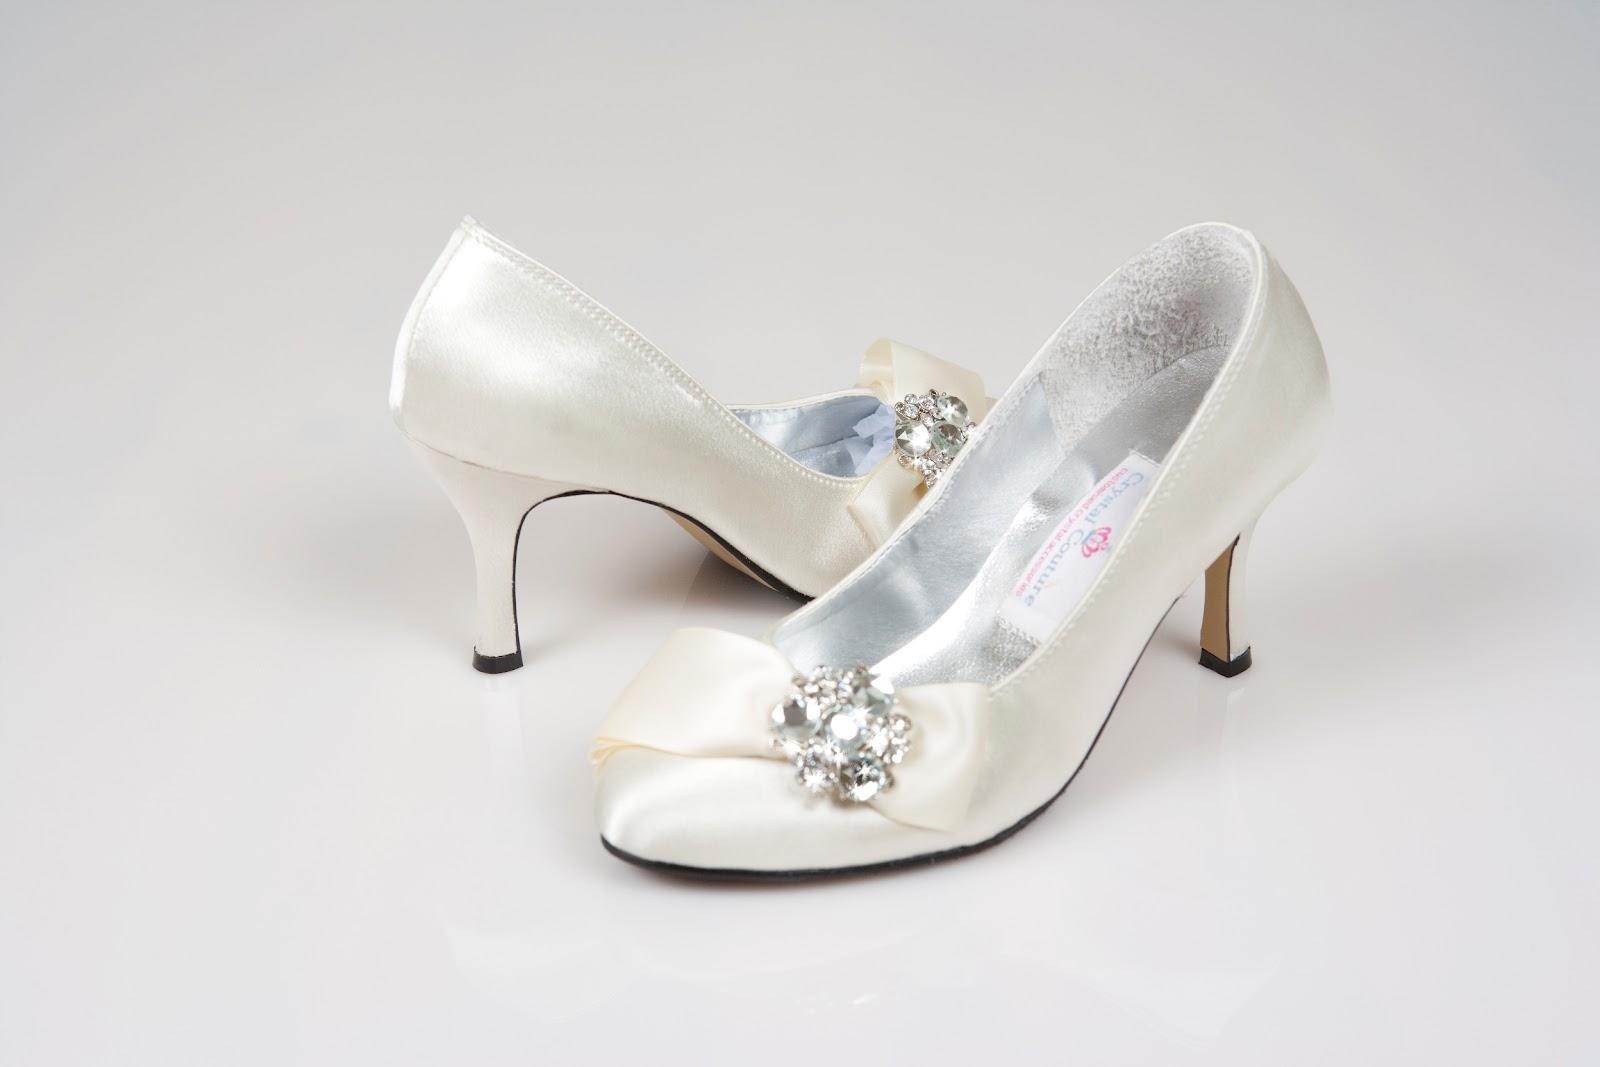 uk shoes: